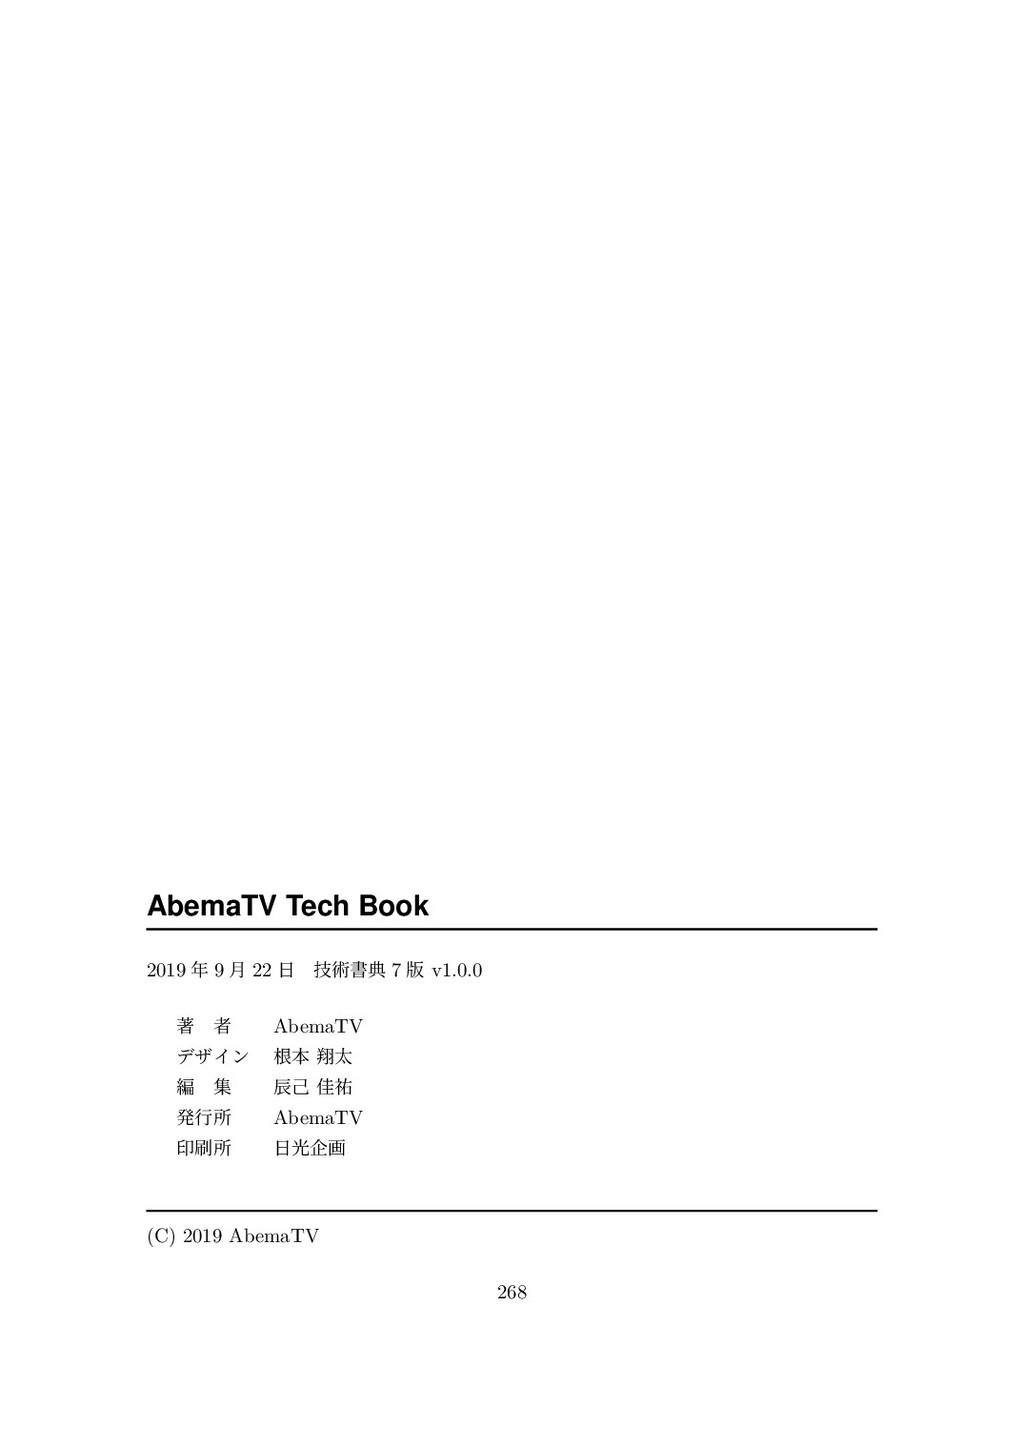 AbemaTV Tech Book 2019 䌑 9 劓 22 傽մ䪫銉剹⪿ 7 曫 v1.0...